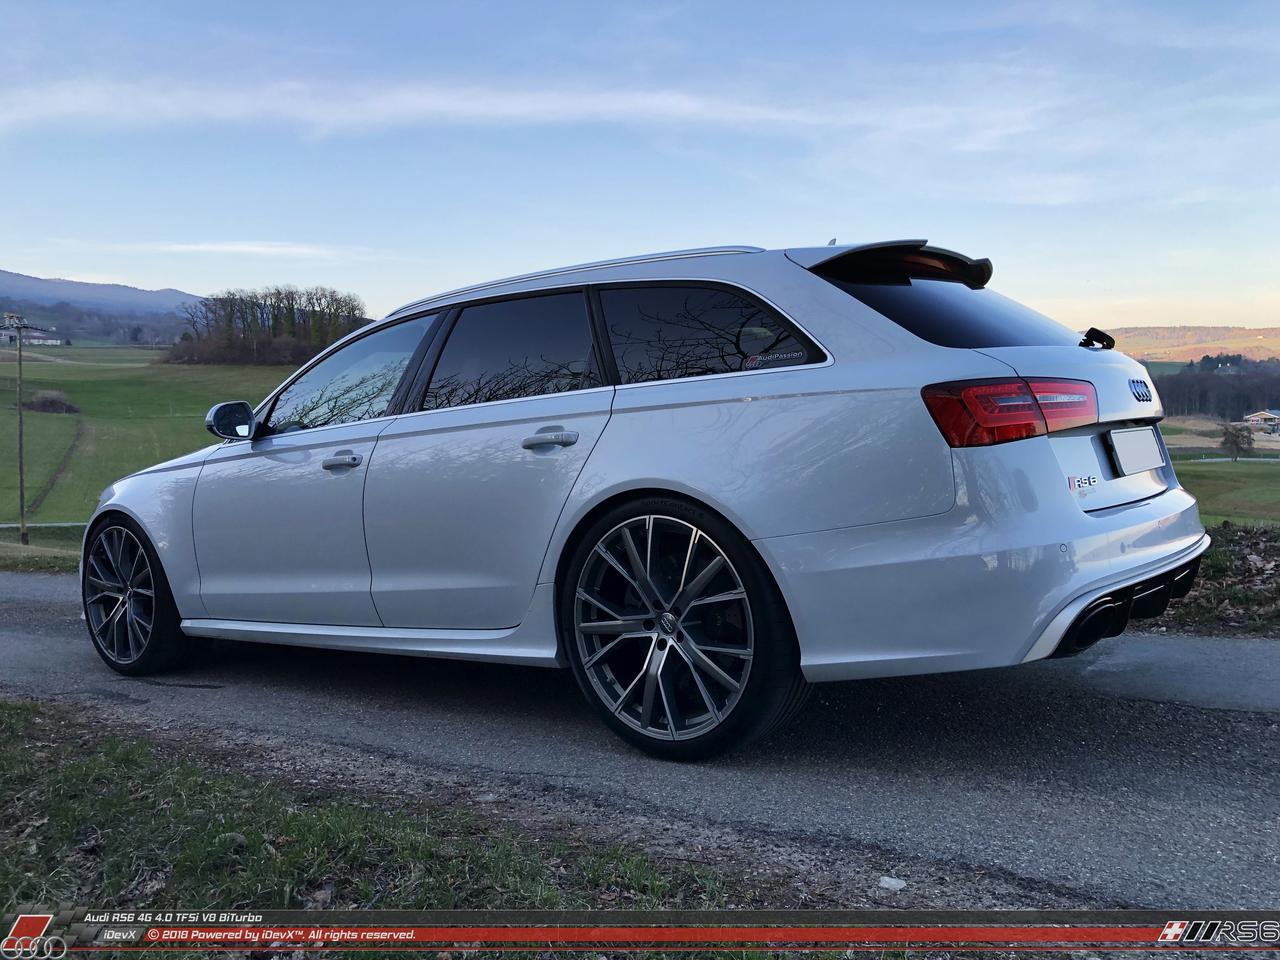 22_02.2019_Audi-RS6_iDevX_007.png